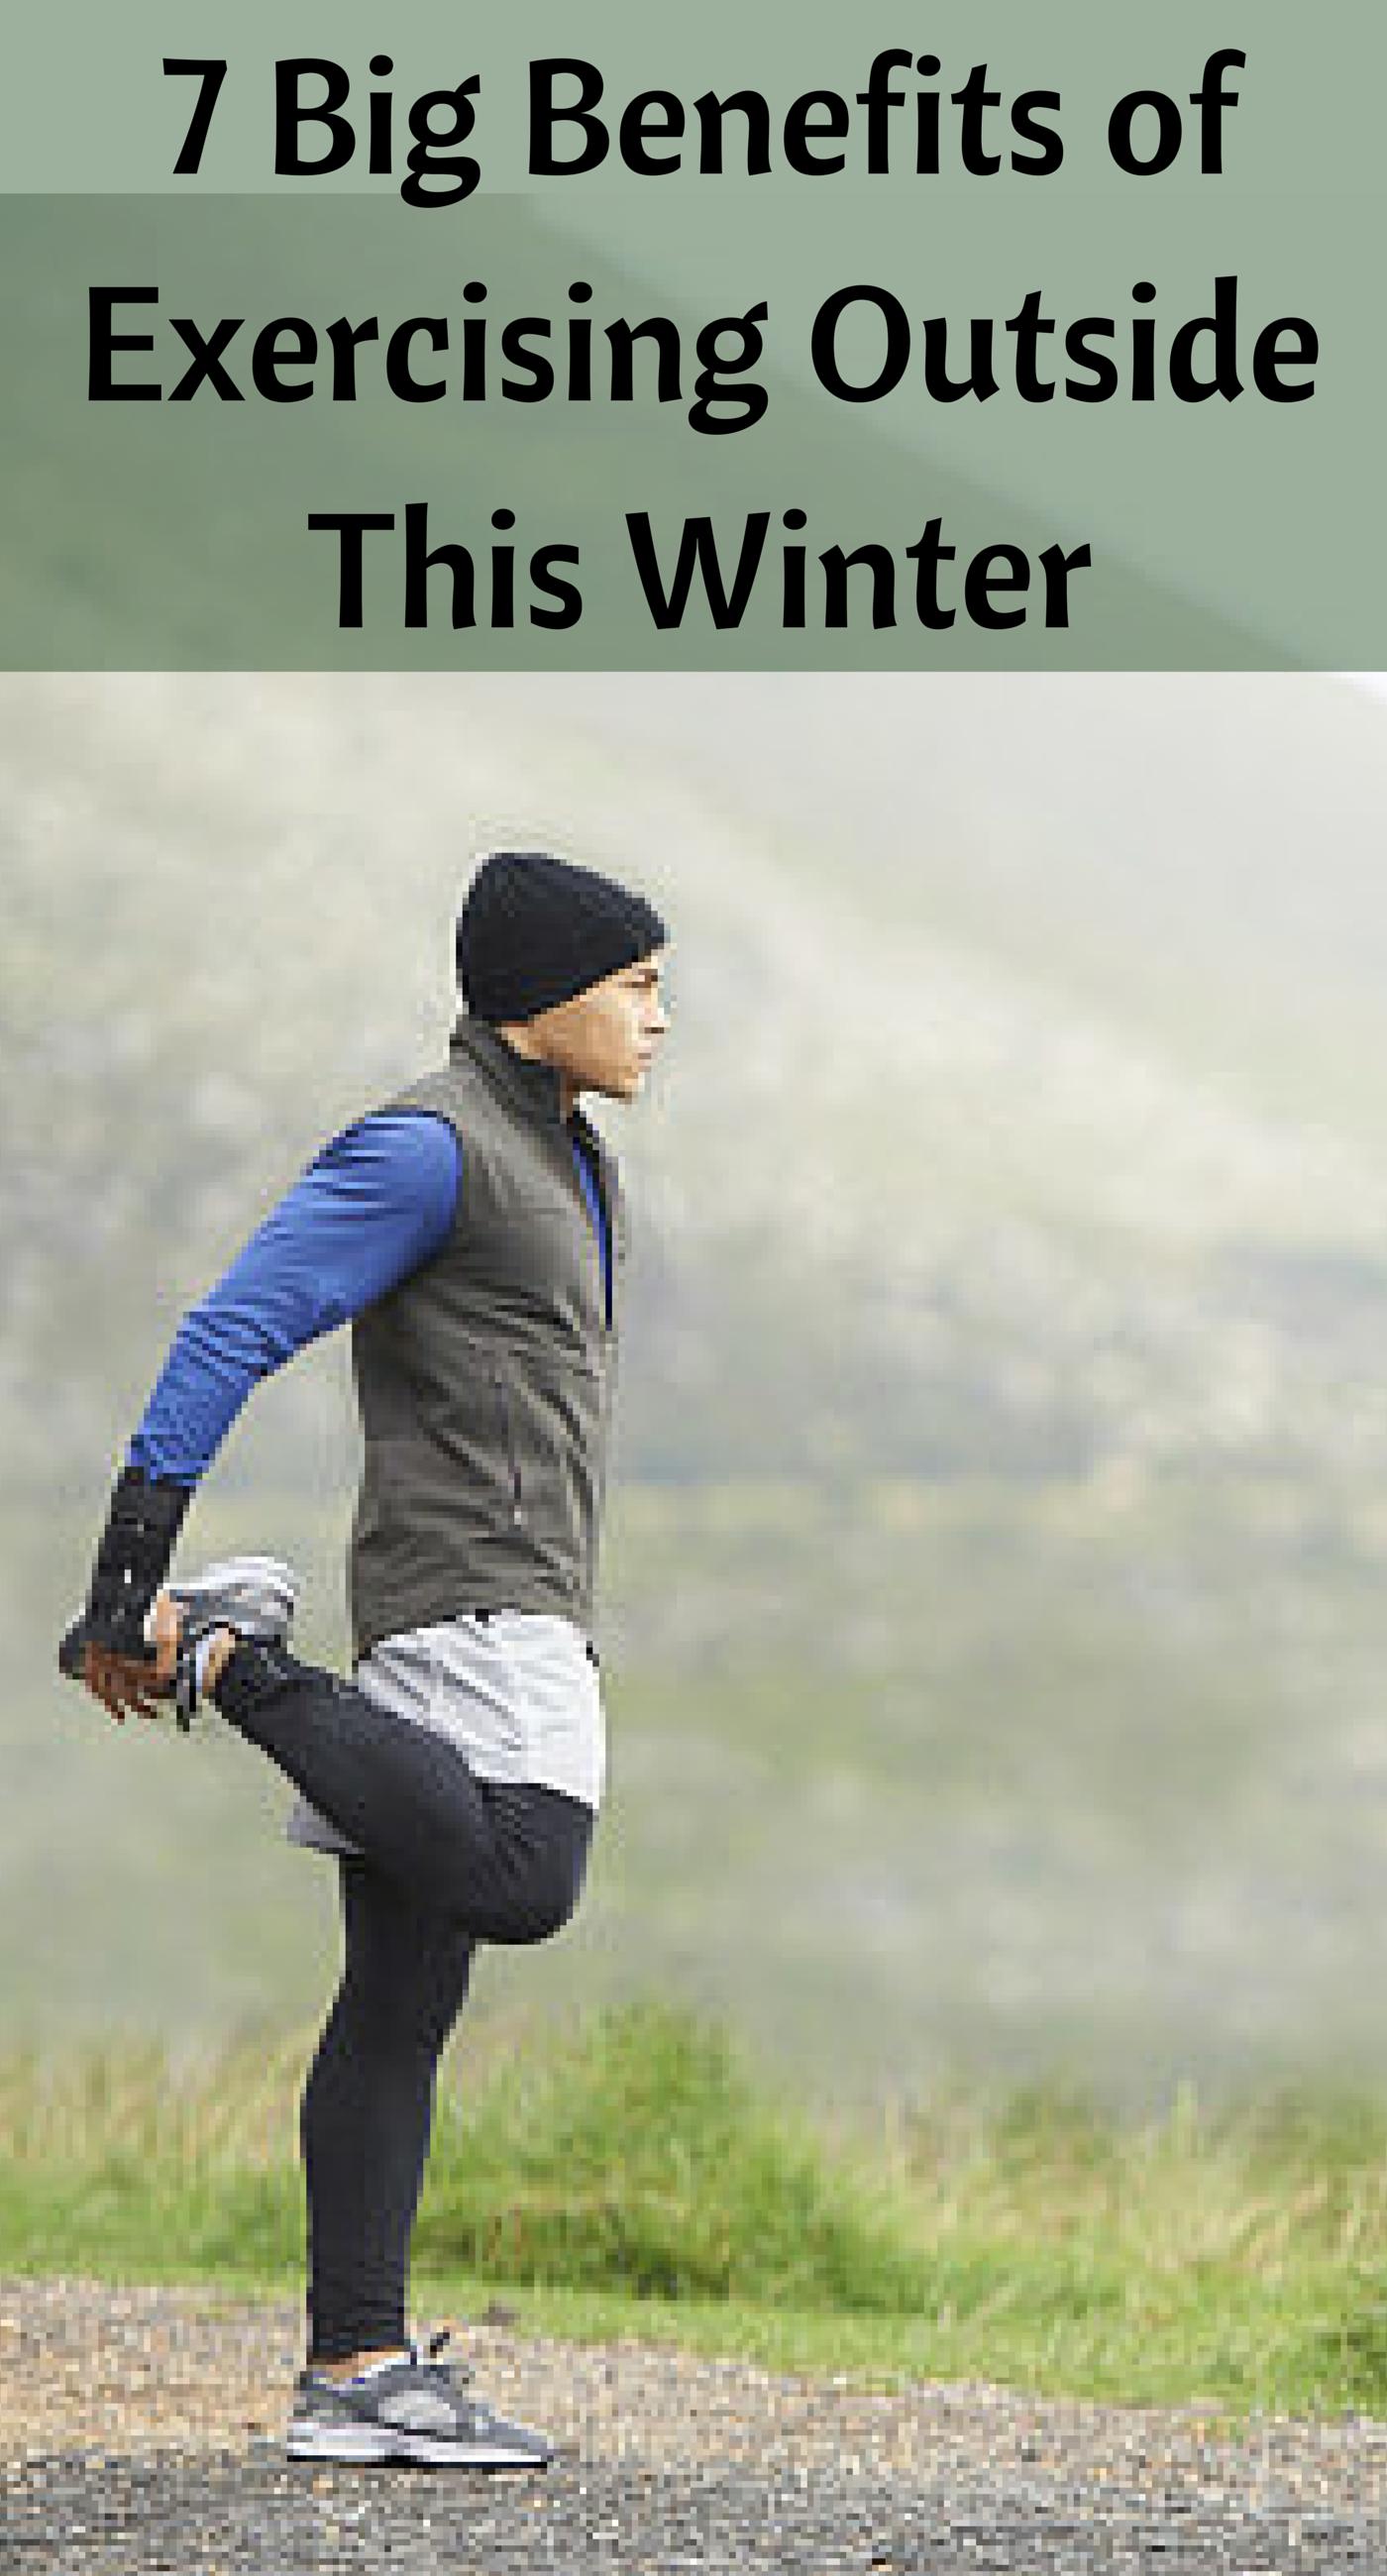 The Fit Shop Winter Workout Winter Workout Workout Workout Plan